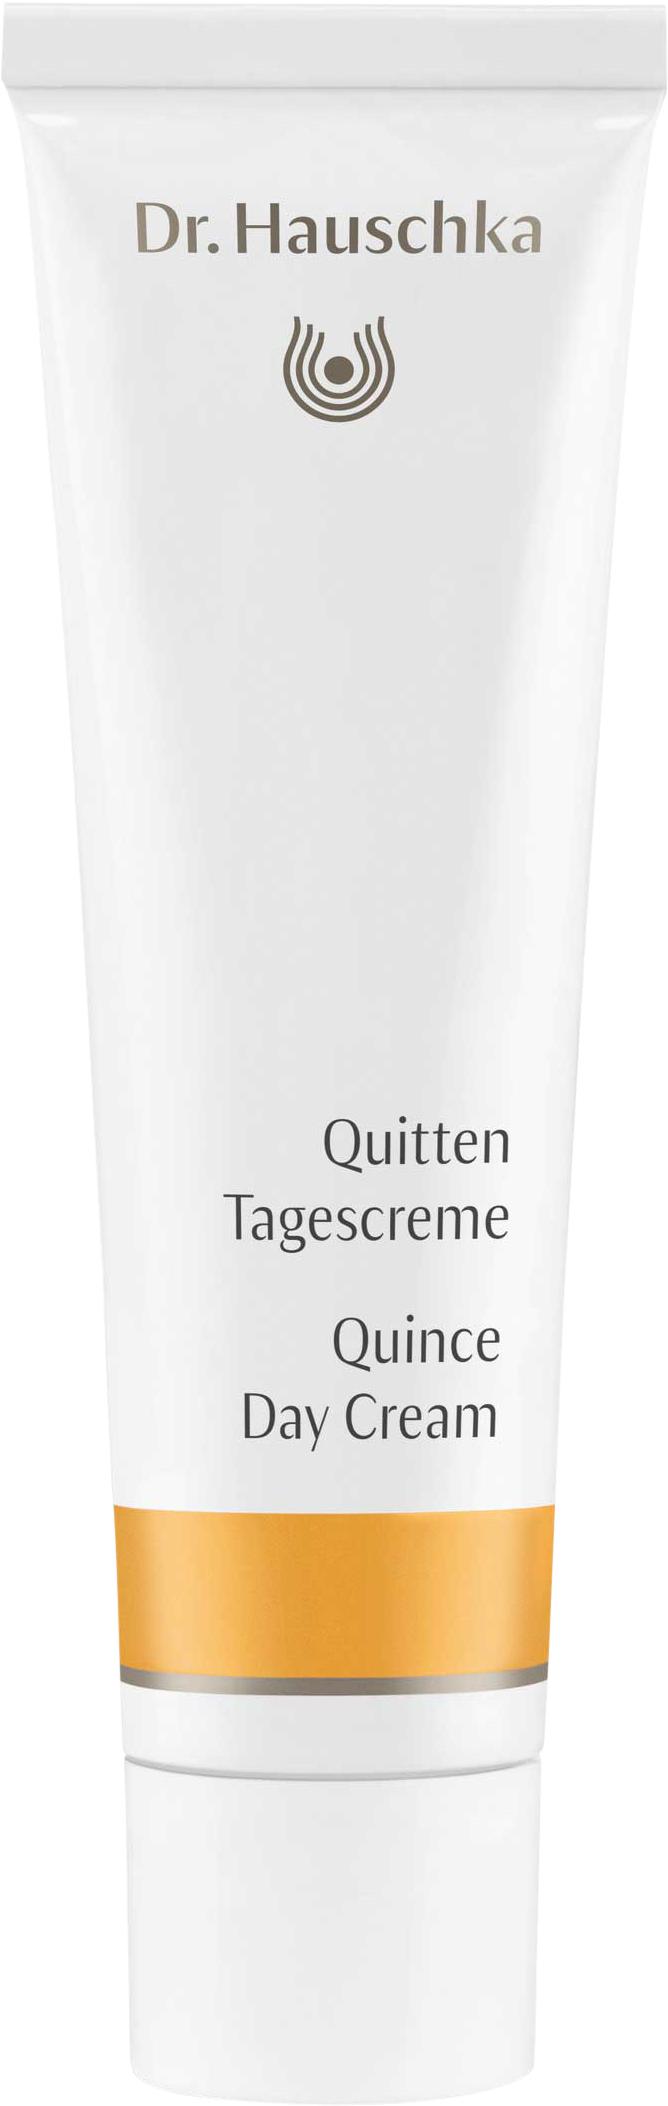 Dr. Hauschka - Quince Day Cream 30 ml